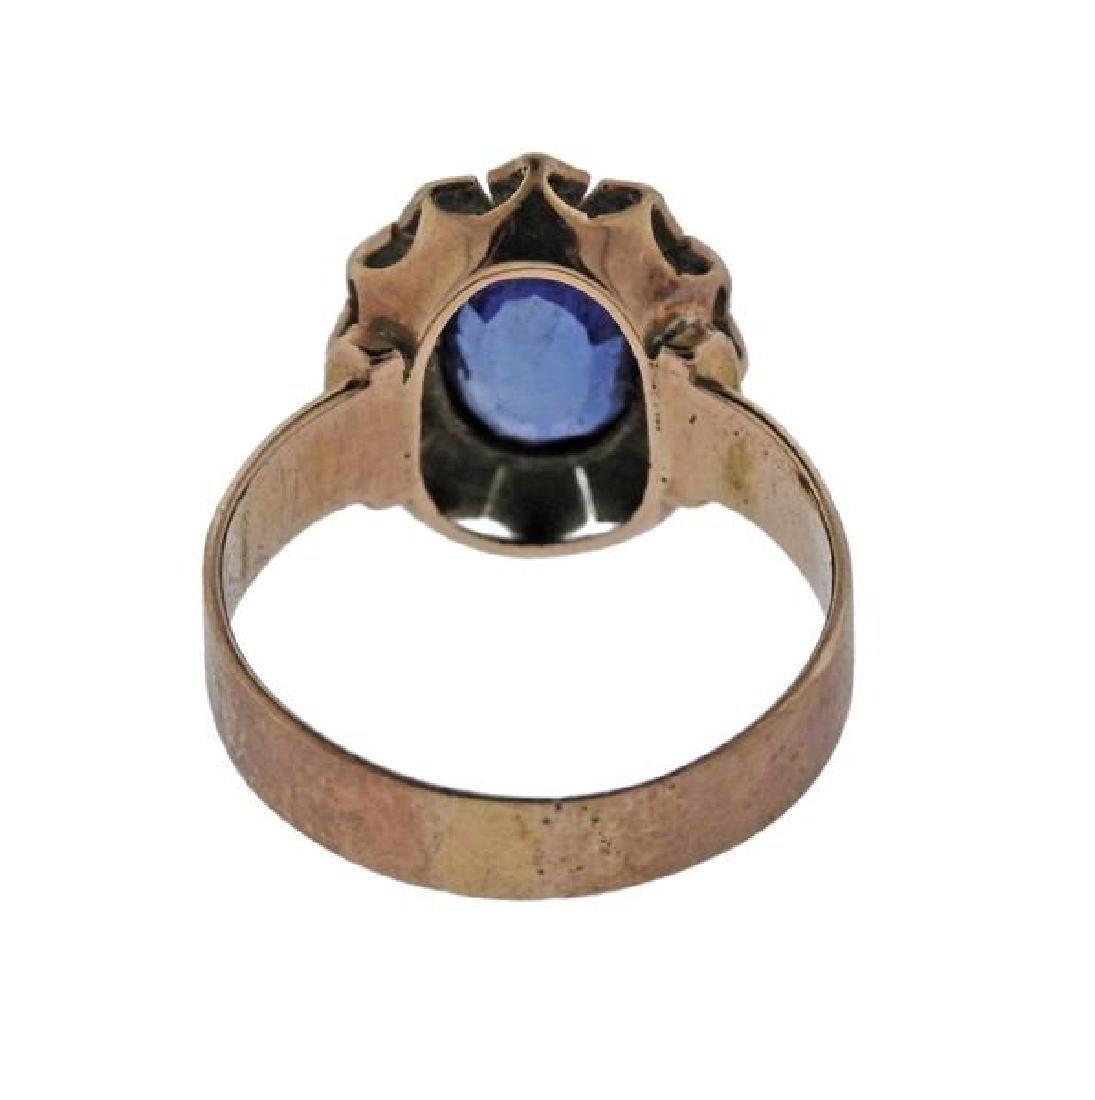 Antique 14K Gold Pearl Blue Gemstone Ring - 3